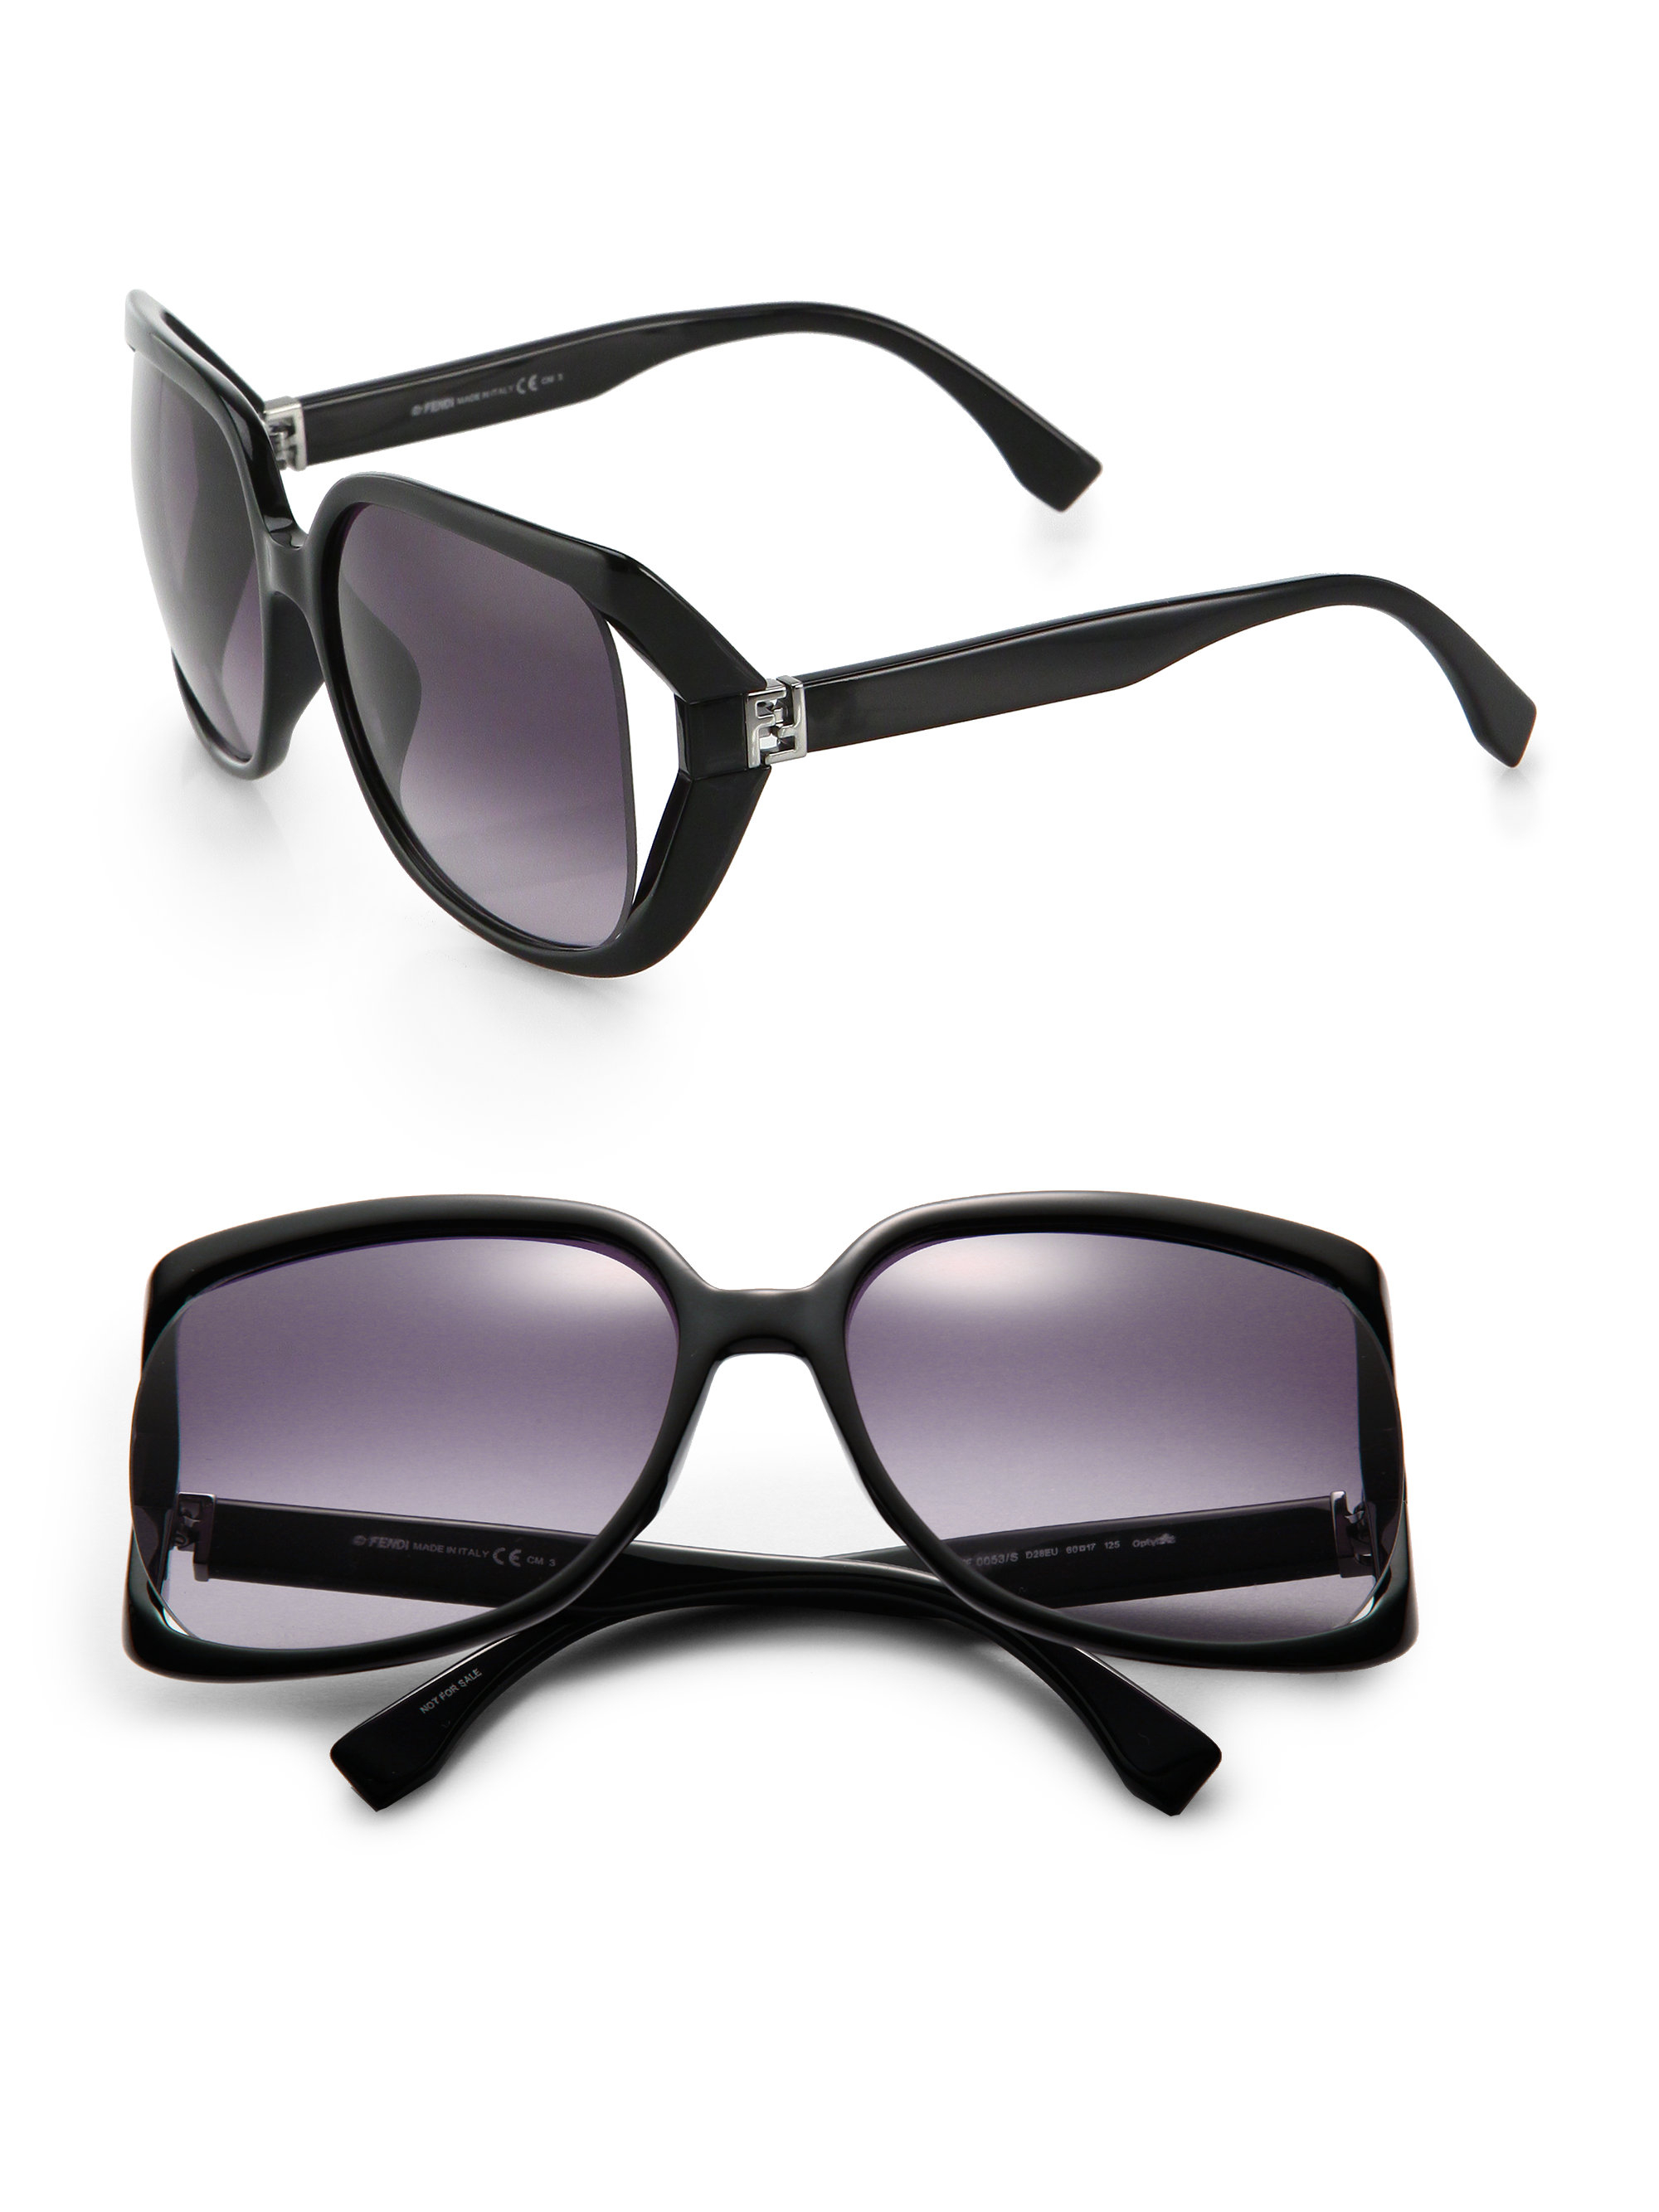 6f2d953112 Fendi Sunglasses Frame Repair